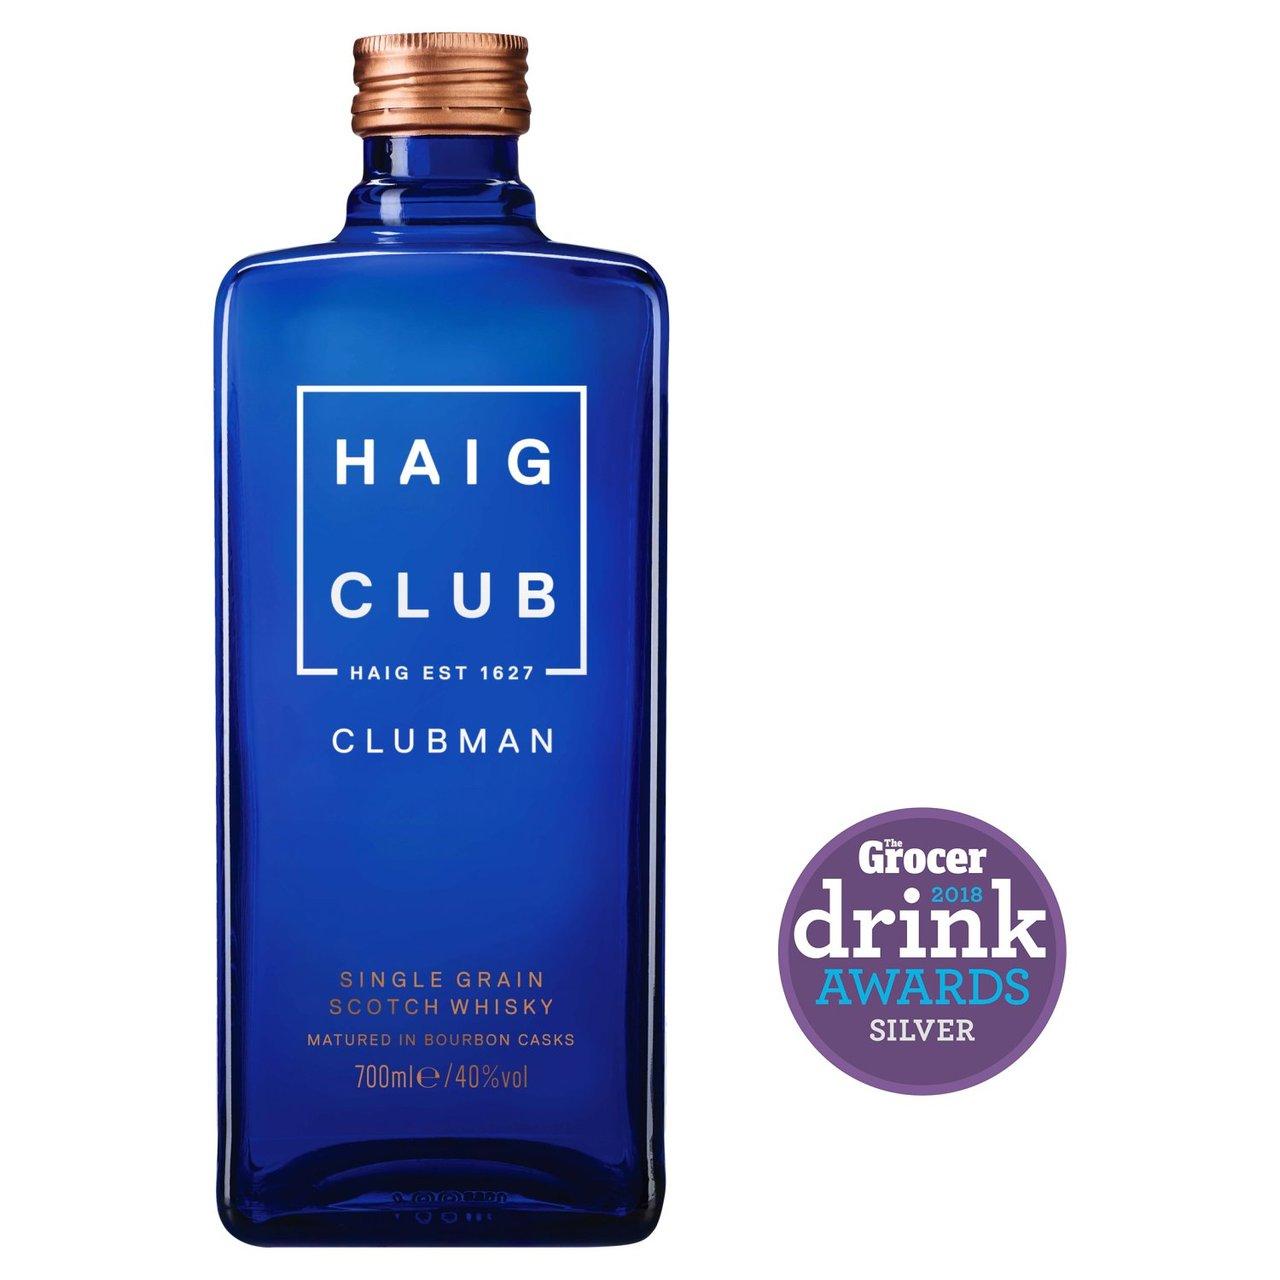 Haig Club Clubman single grain whisky £15.99 @ Morrisons